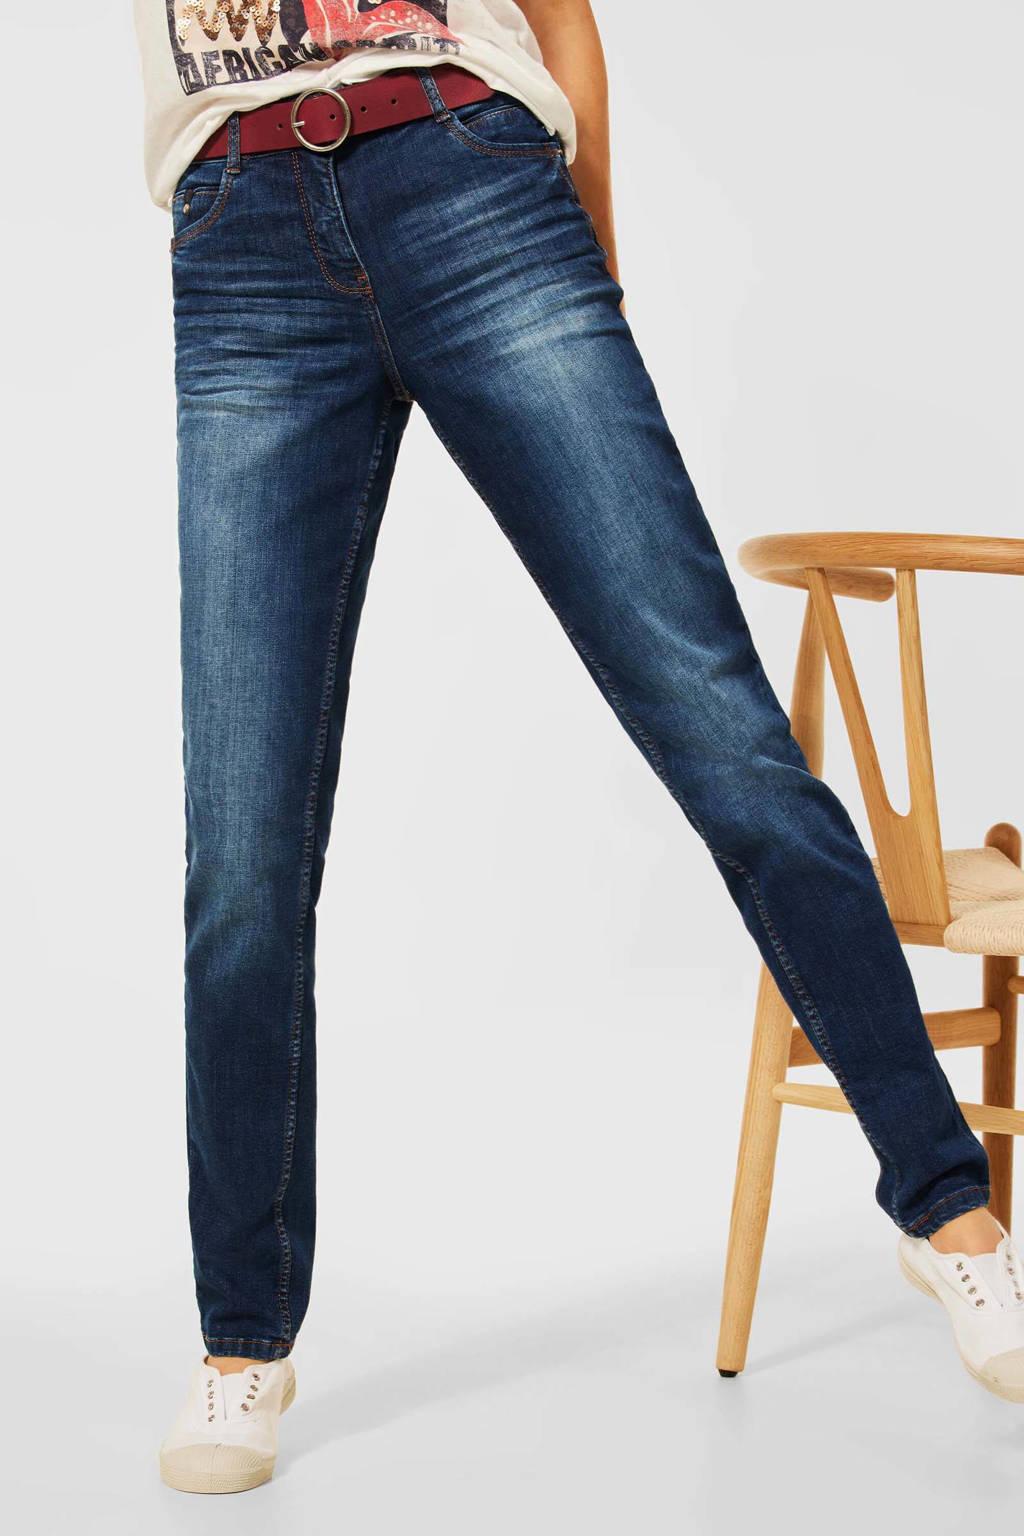 CECIL high waist slim fit jeans Toronto mid blue used wash, Mid blue used wash